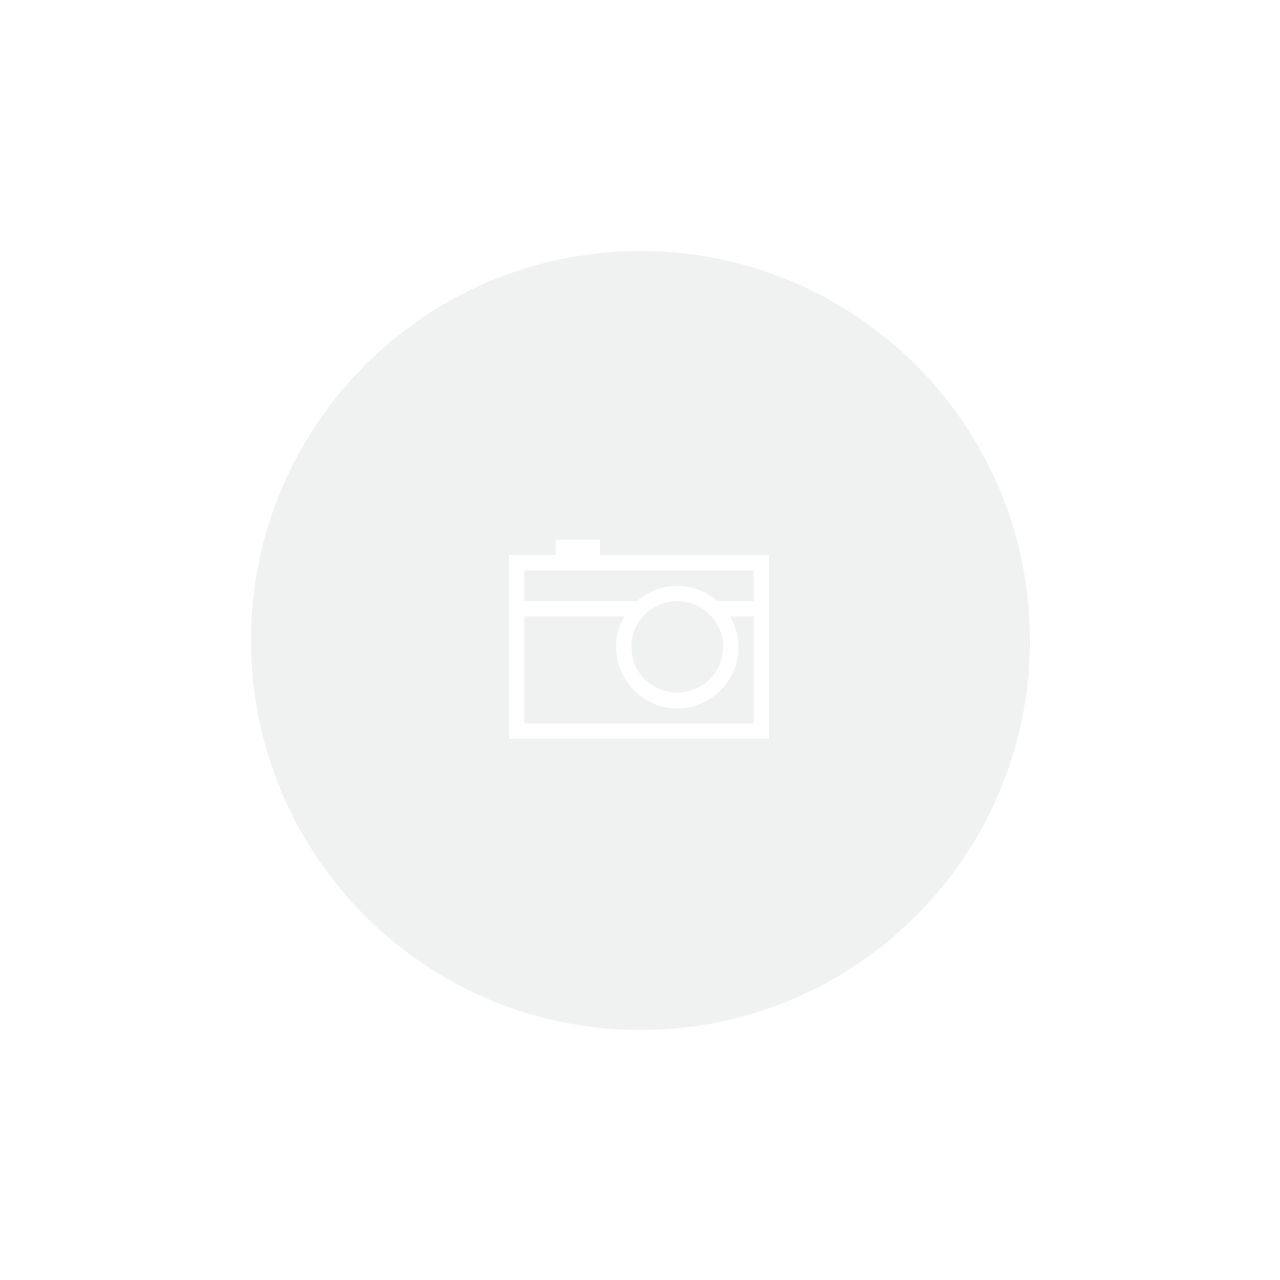 Faqueiro Aço Inox 130 pcs Classic Tramontina